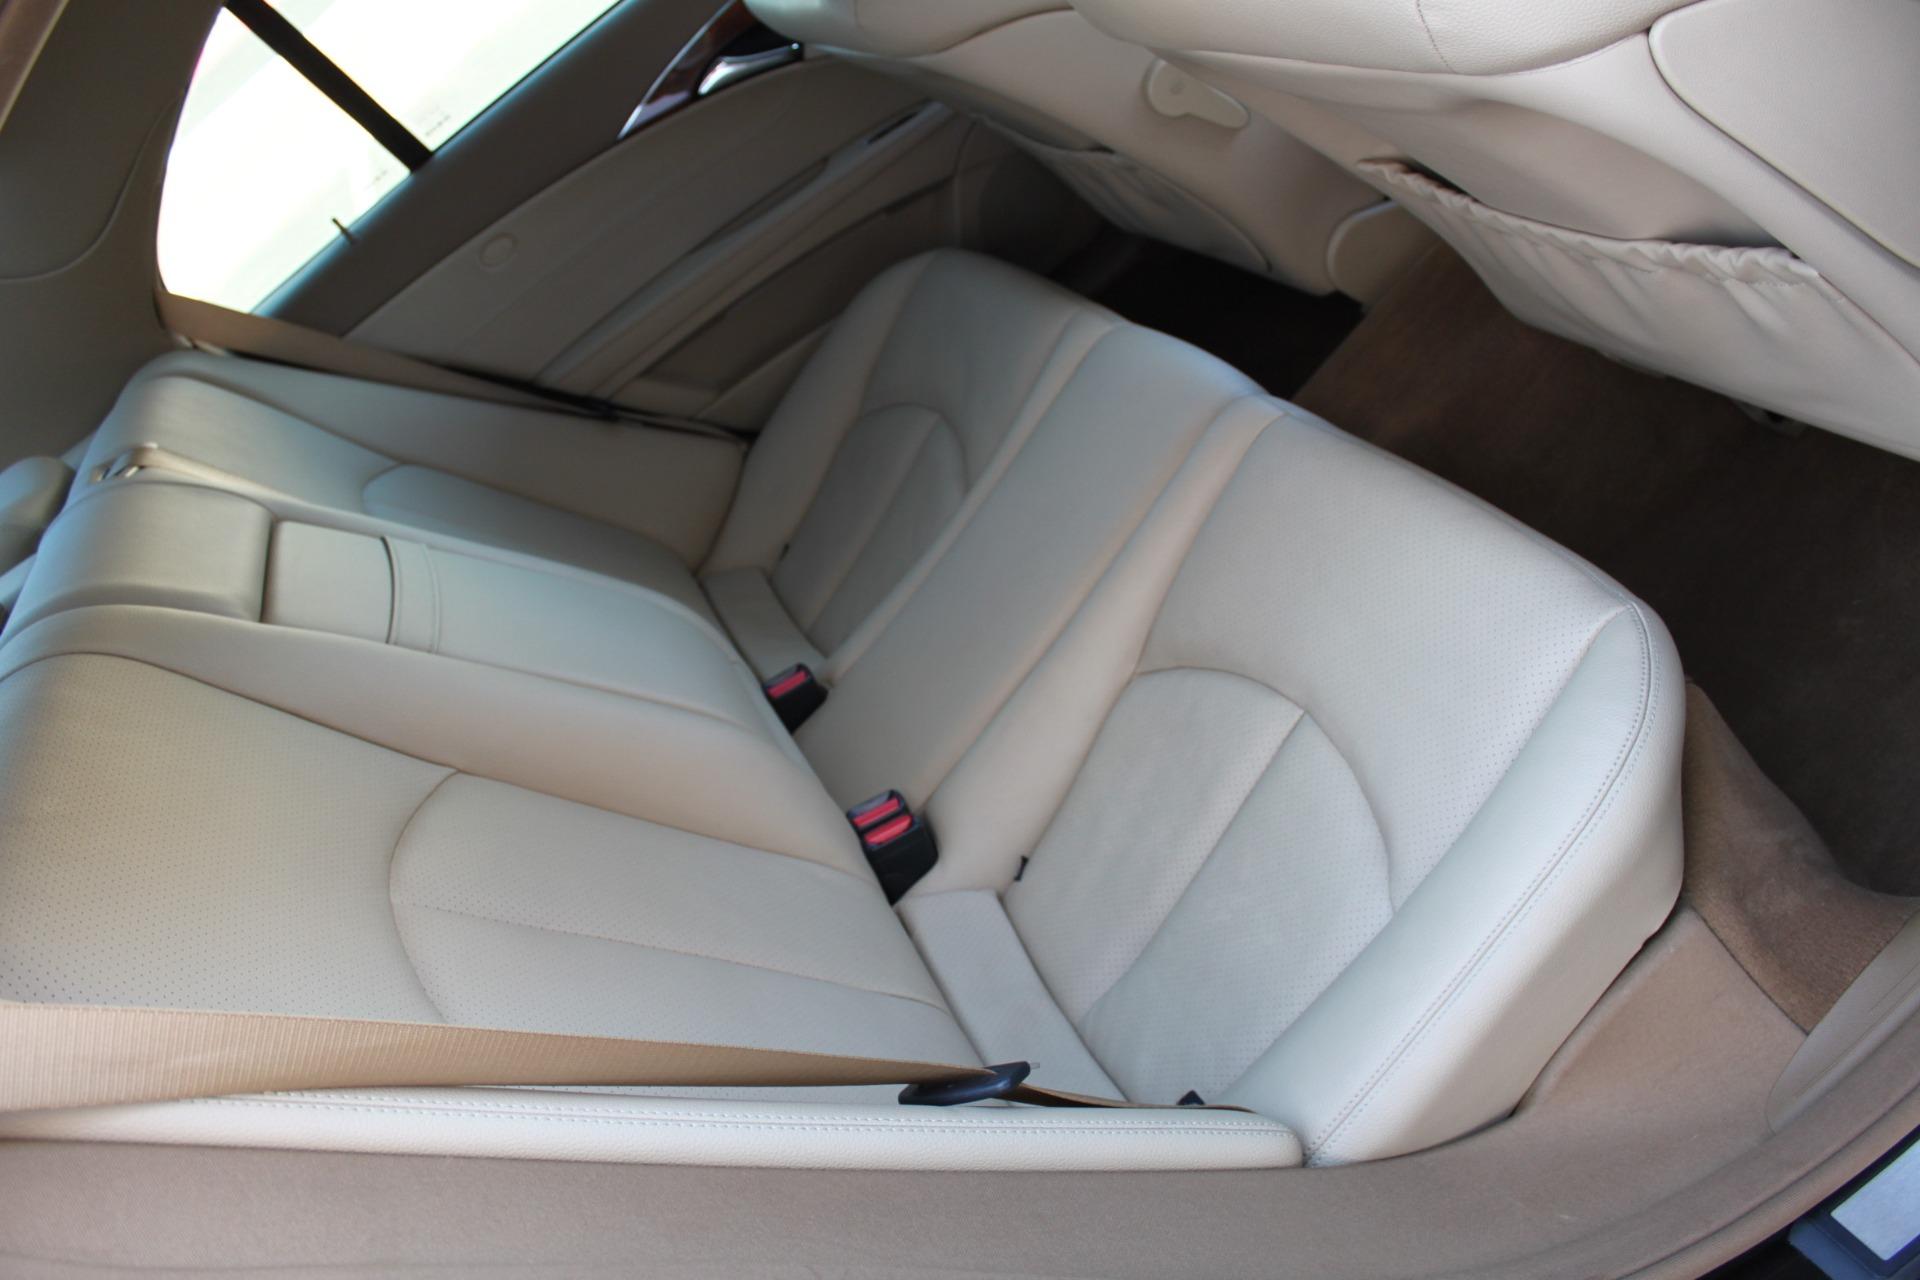 Used-2009-Mercedes-Benz-E-Class-E320-30L-BlueTEC-Fiat